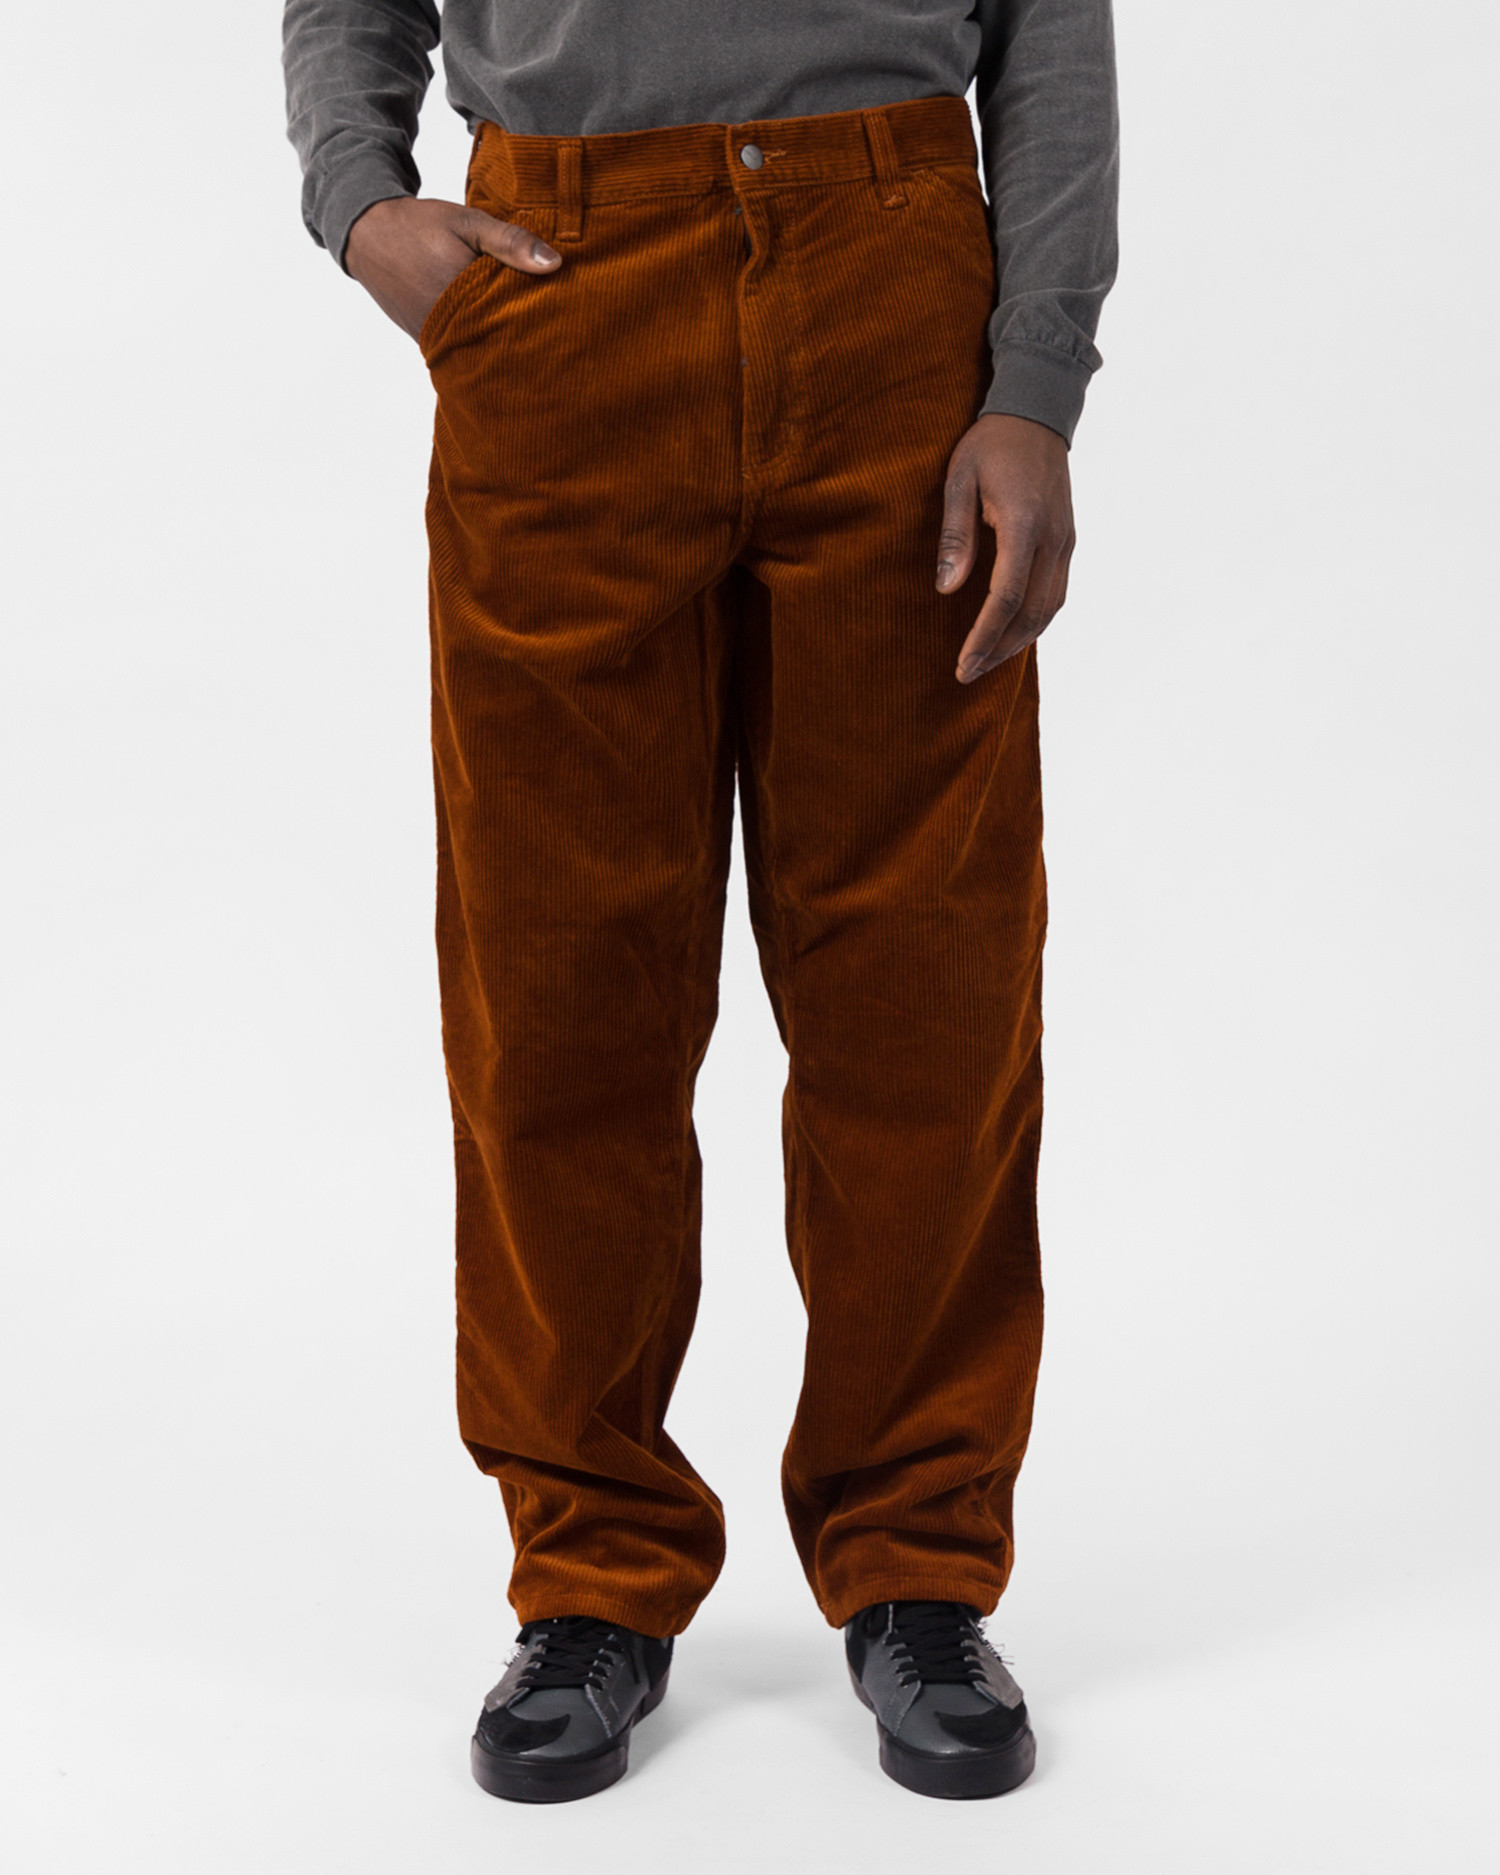 Carhartt Single Knee Pant Cotton Brandy Rinsed